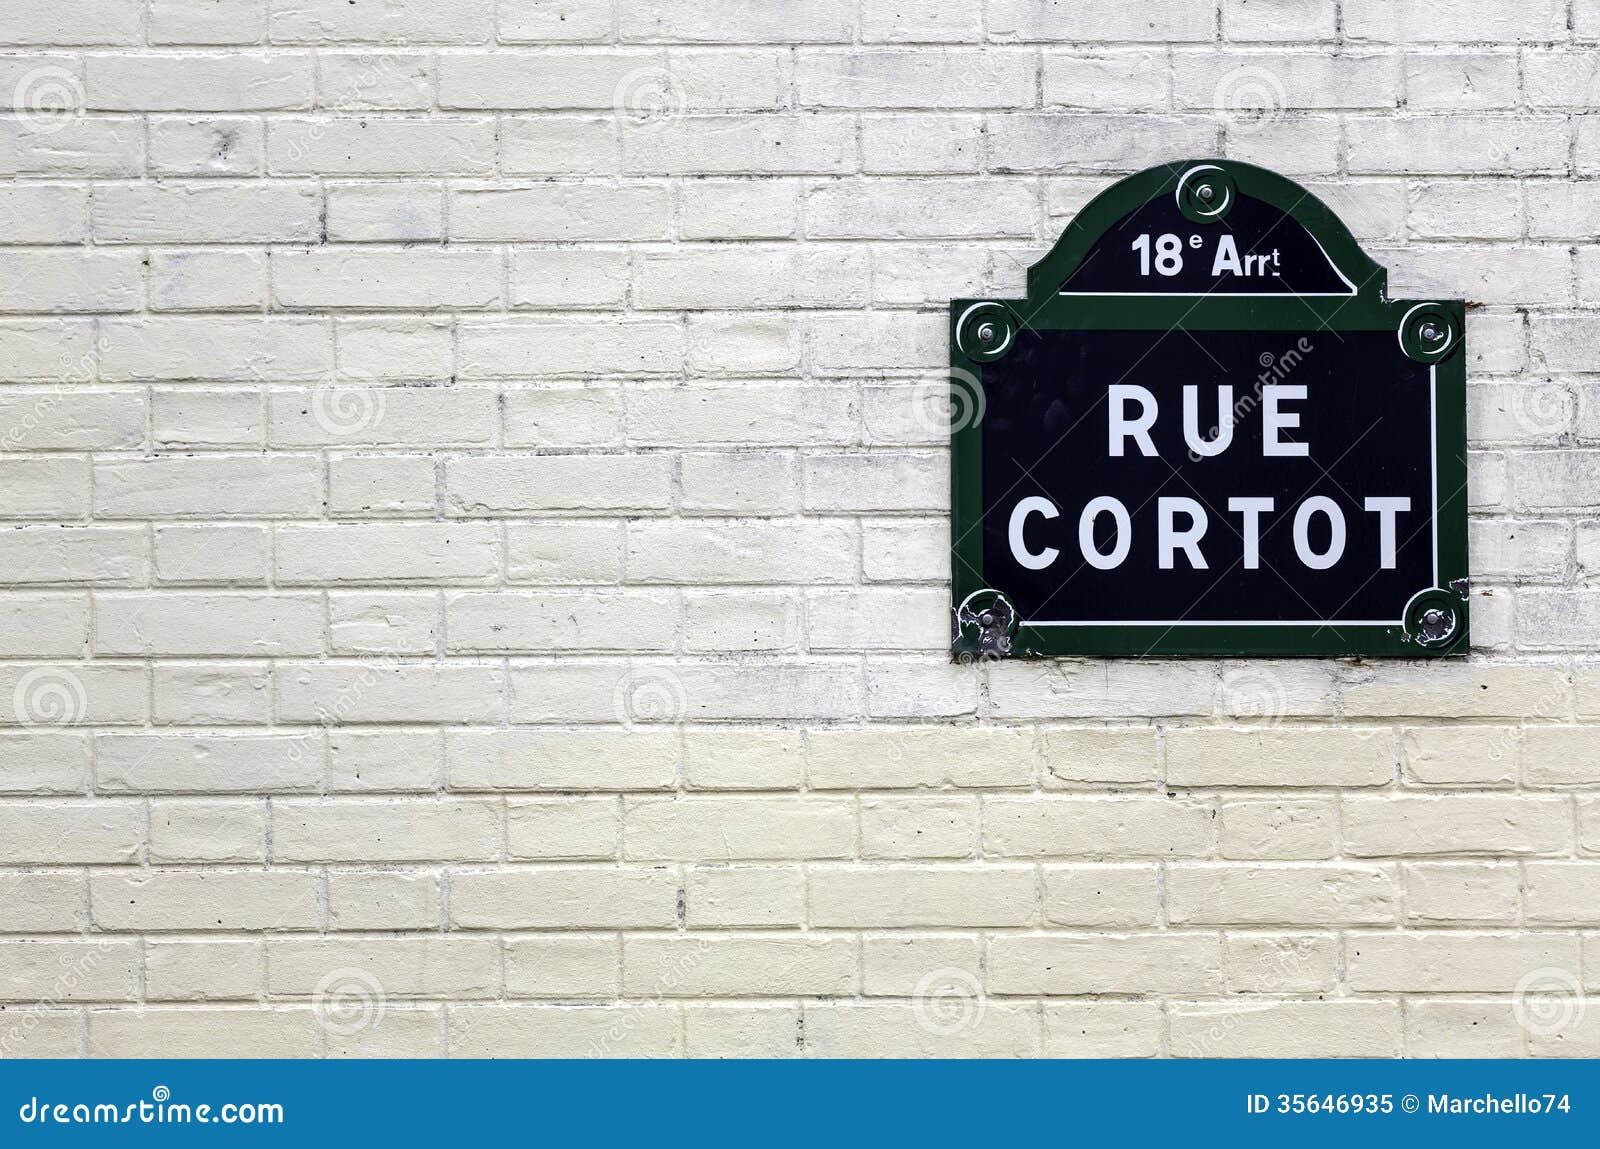 White Brick Wall Street Traditional Paris Plaque Name